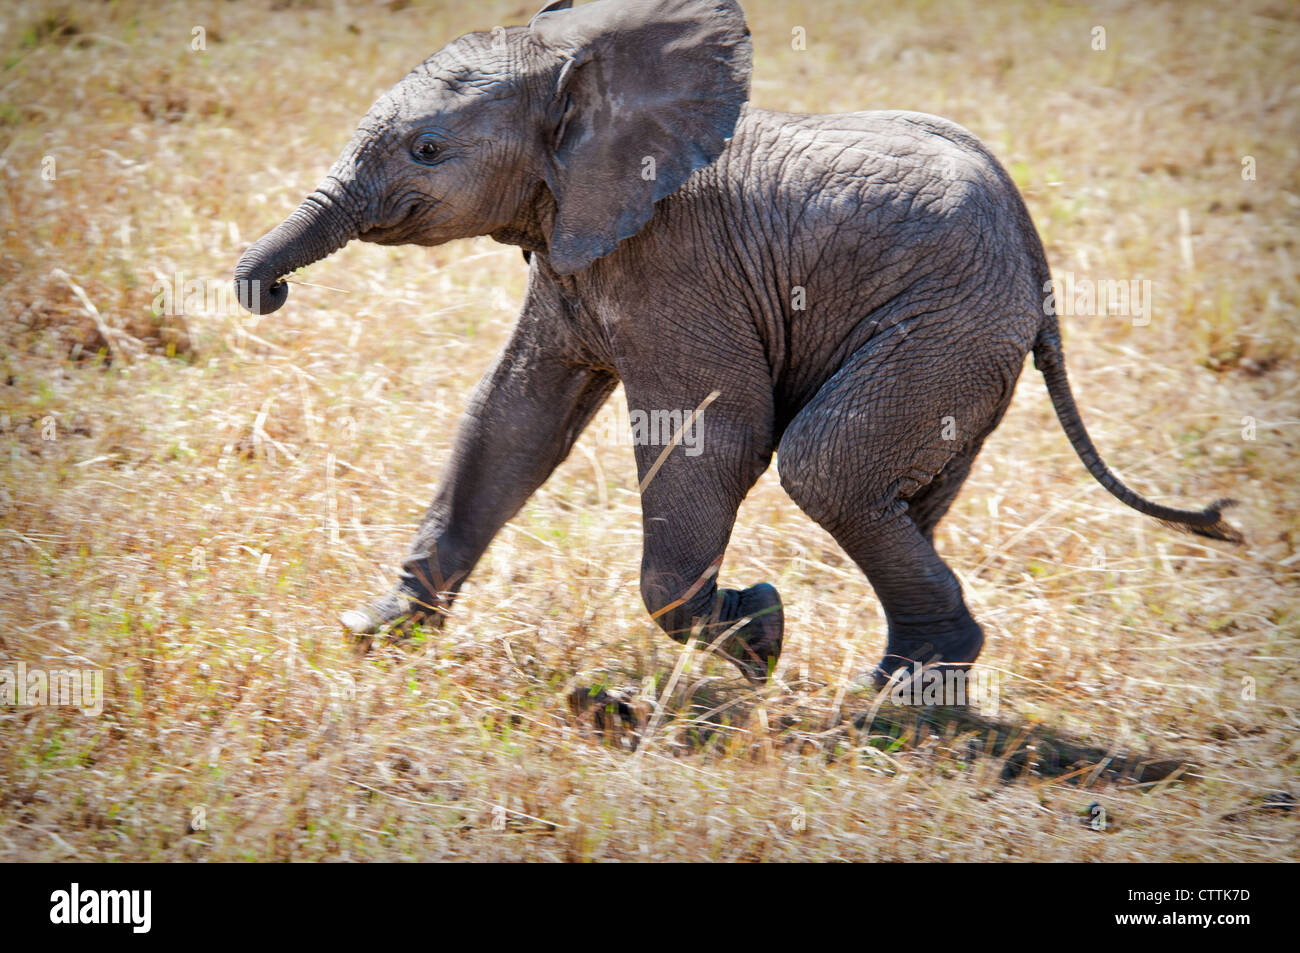 Solitary African Elephant Calf, Loxodonta africana, Masai Mara National Reserve, Kenya, Africa - Stock Image